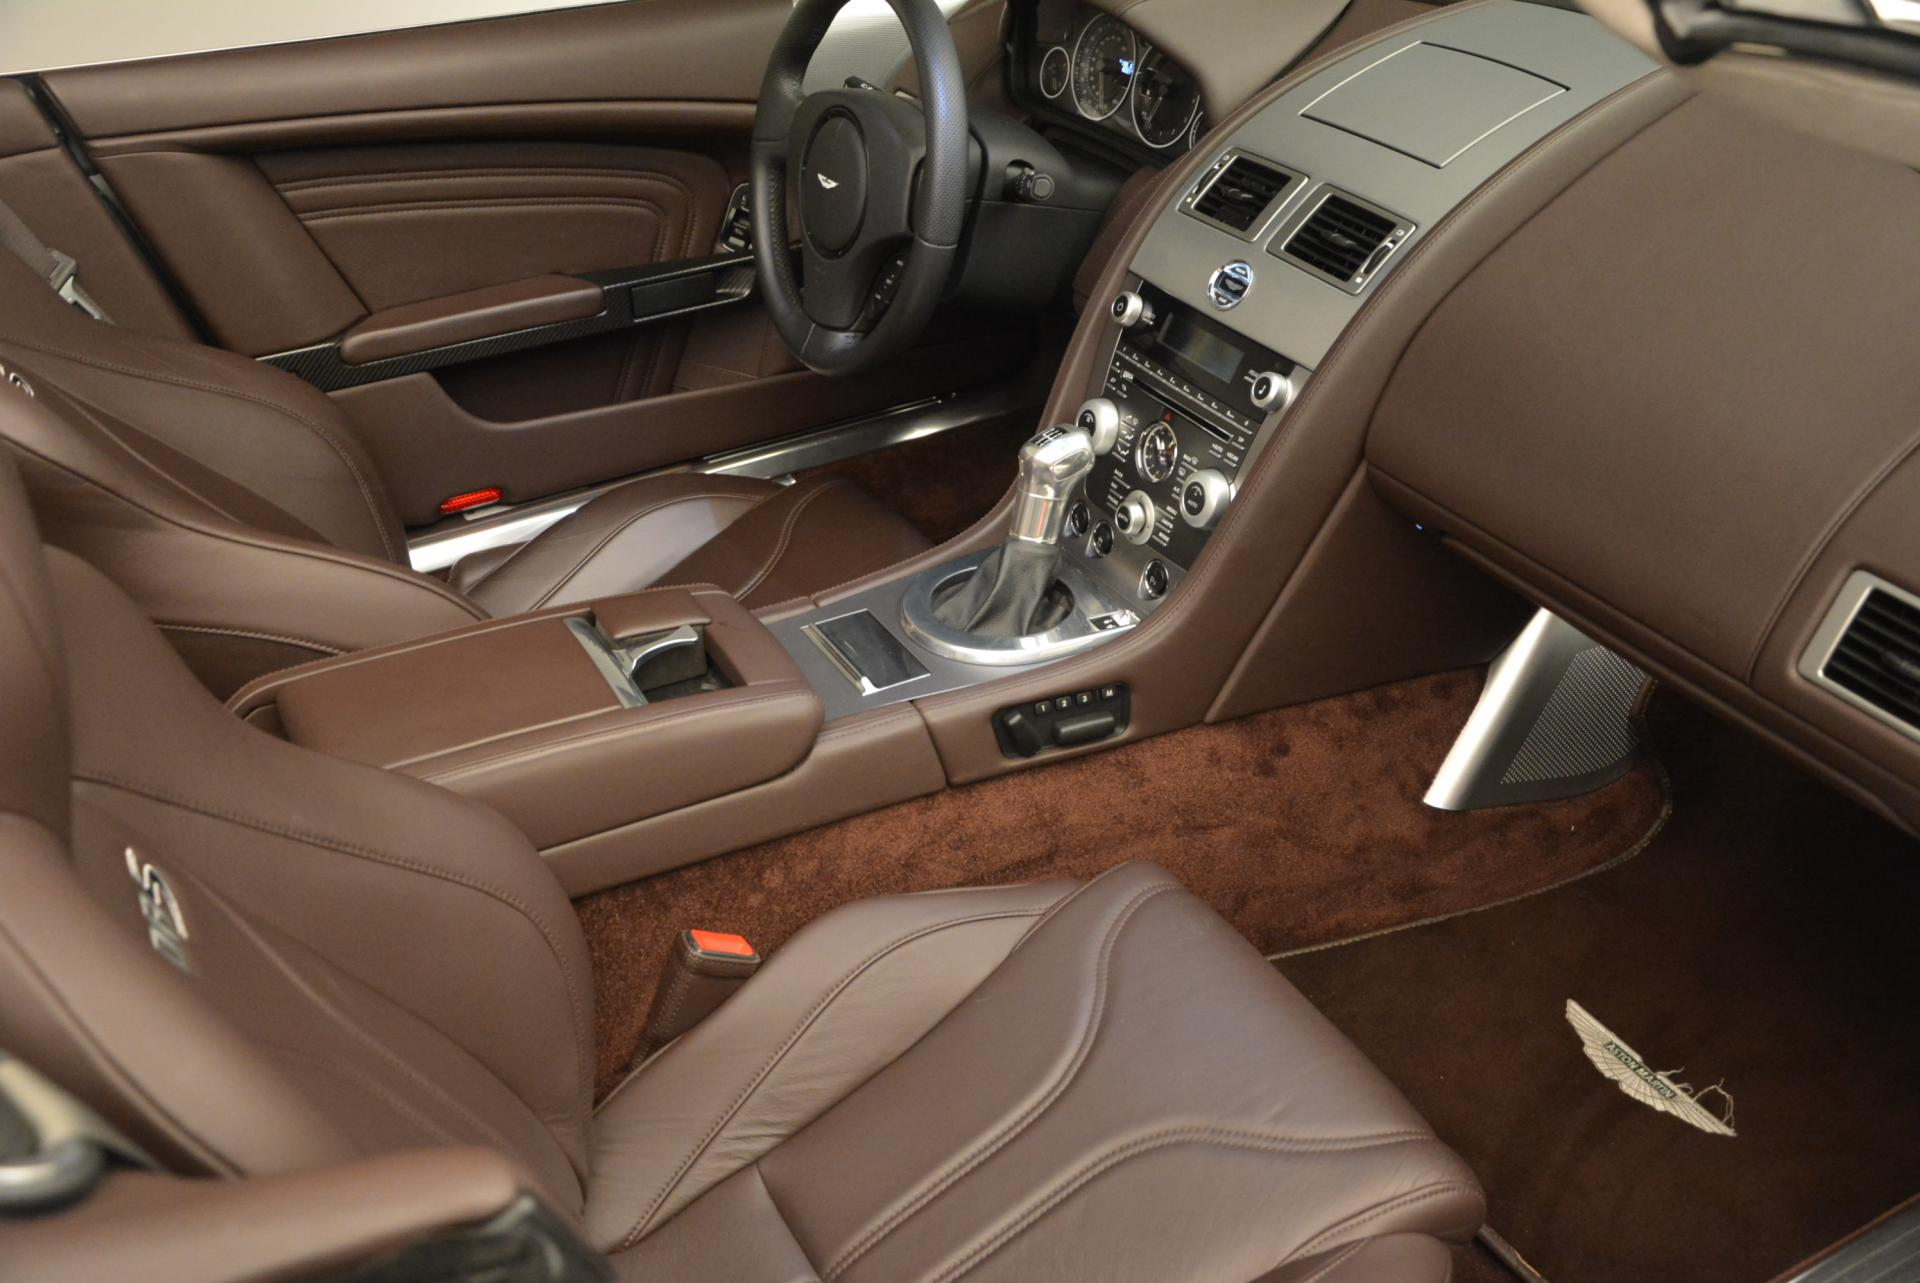 Used 2010 Aston Martin DBS Volante For Sale In Greenwich, CT 87_p35